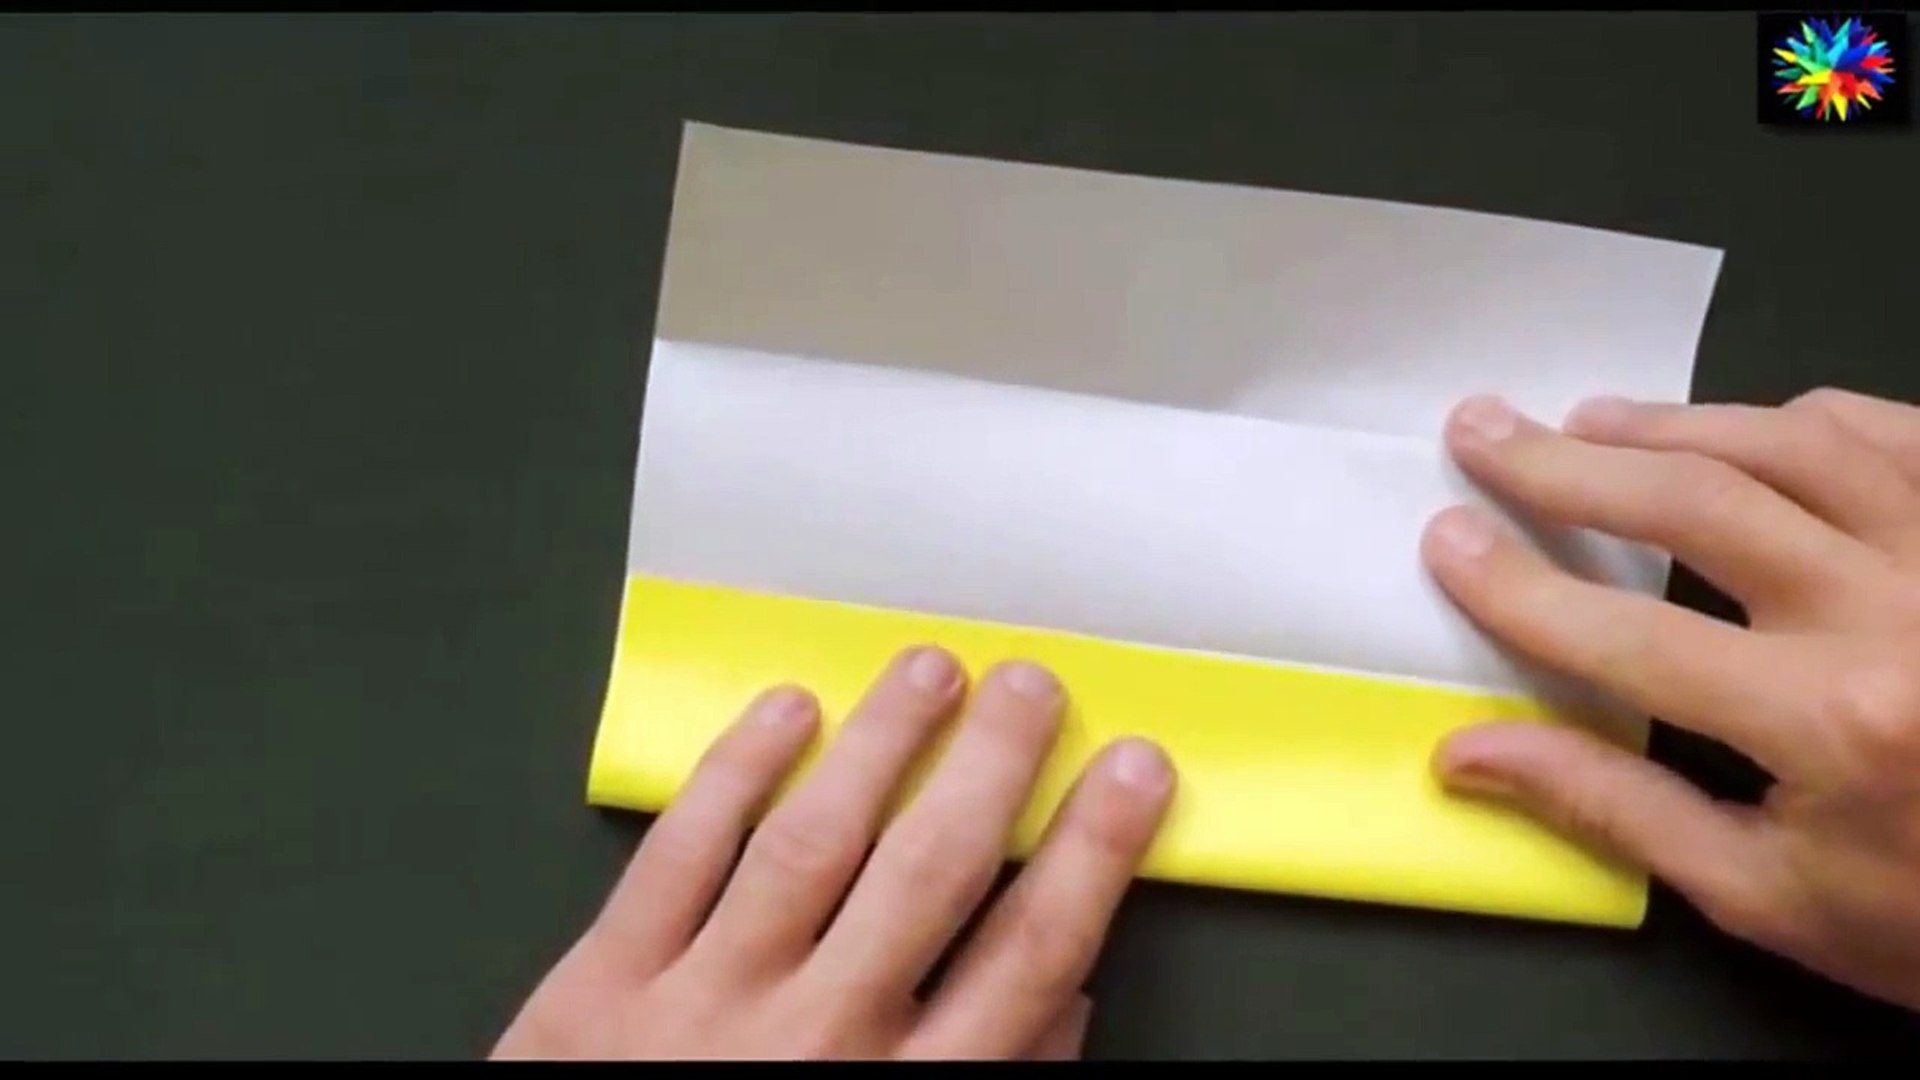 How to make a Paper Box Origami /  Как сделать Коробку из Бумаги Оригами